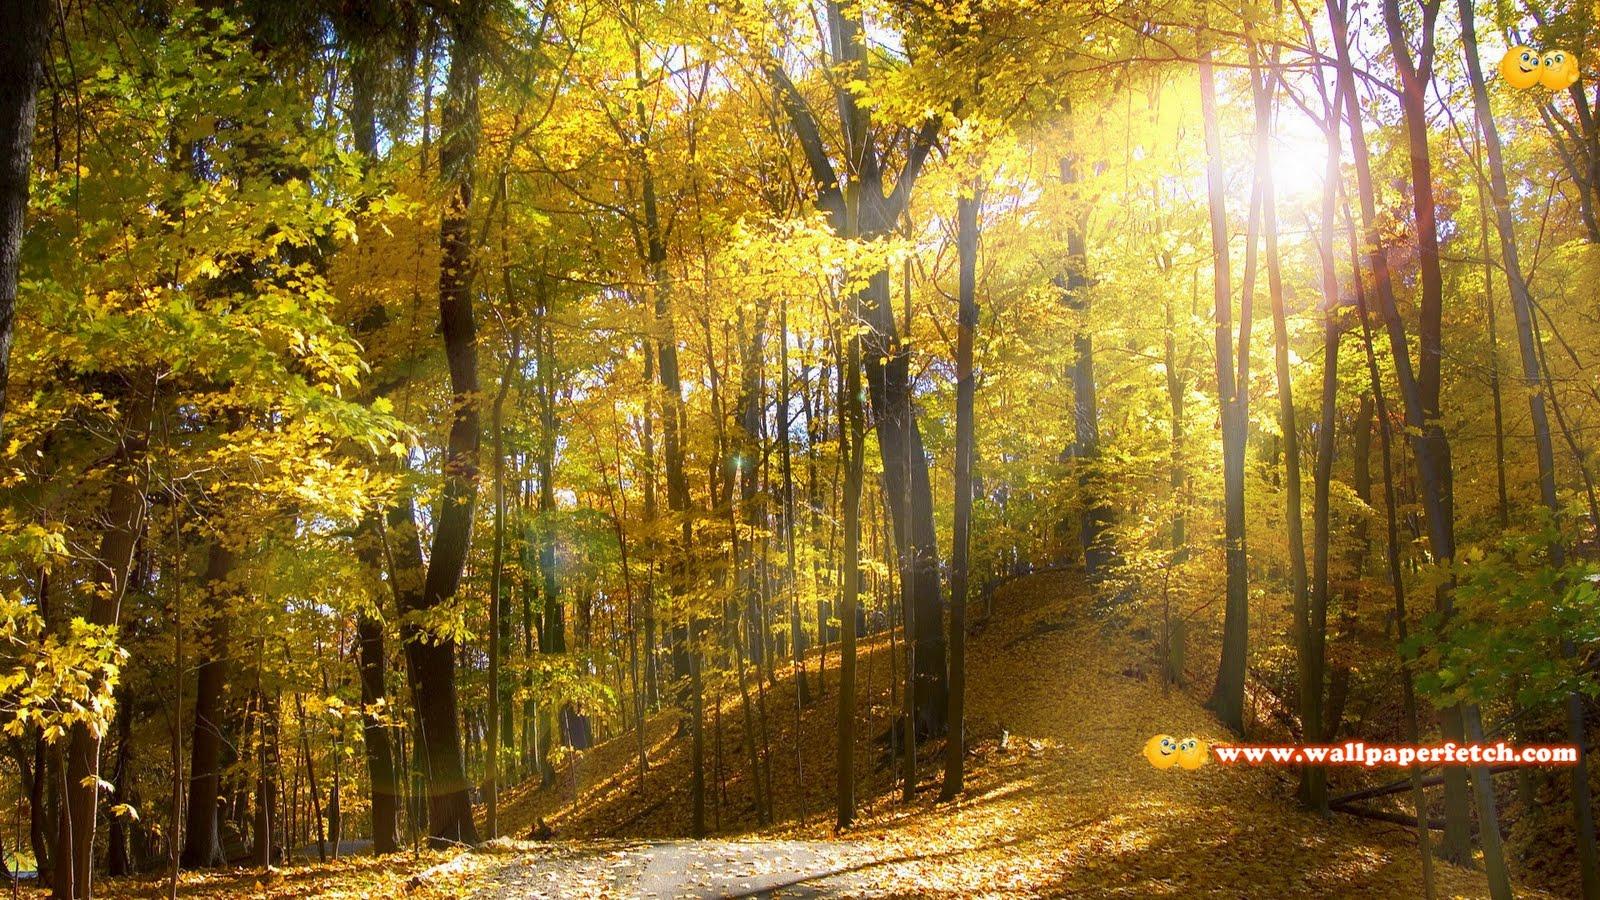 http://3.bp.blogspot.com/-e5l742fQ-r4/TwCRNVo_5MI/AAAAAAAAG80/bg8Mgu3-6uM/s1600/SuperPack_Beautiful_Nature_HD_Wallpapers_Part_83.131.jpg